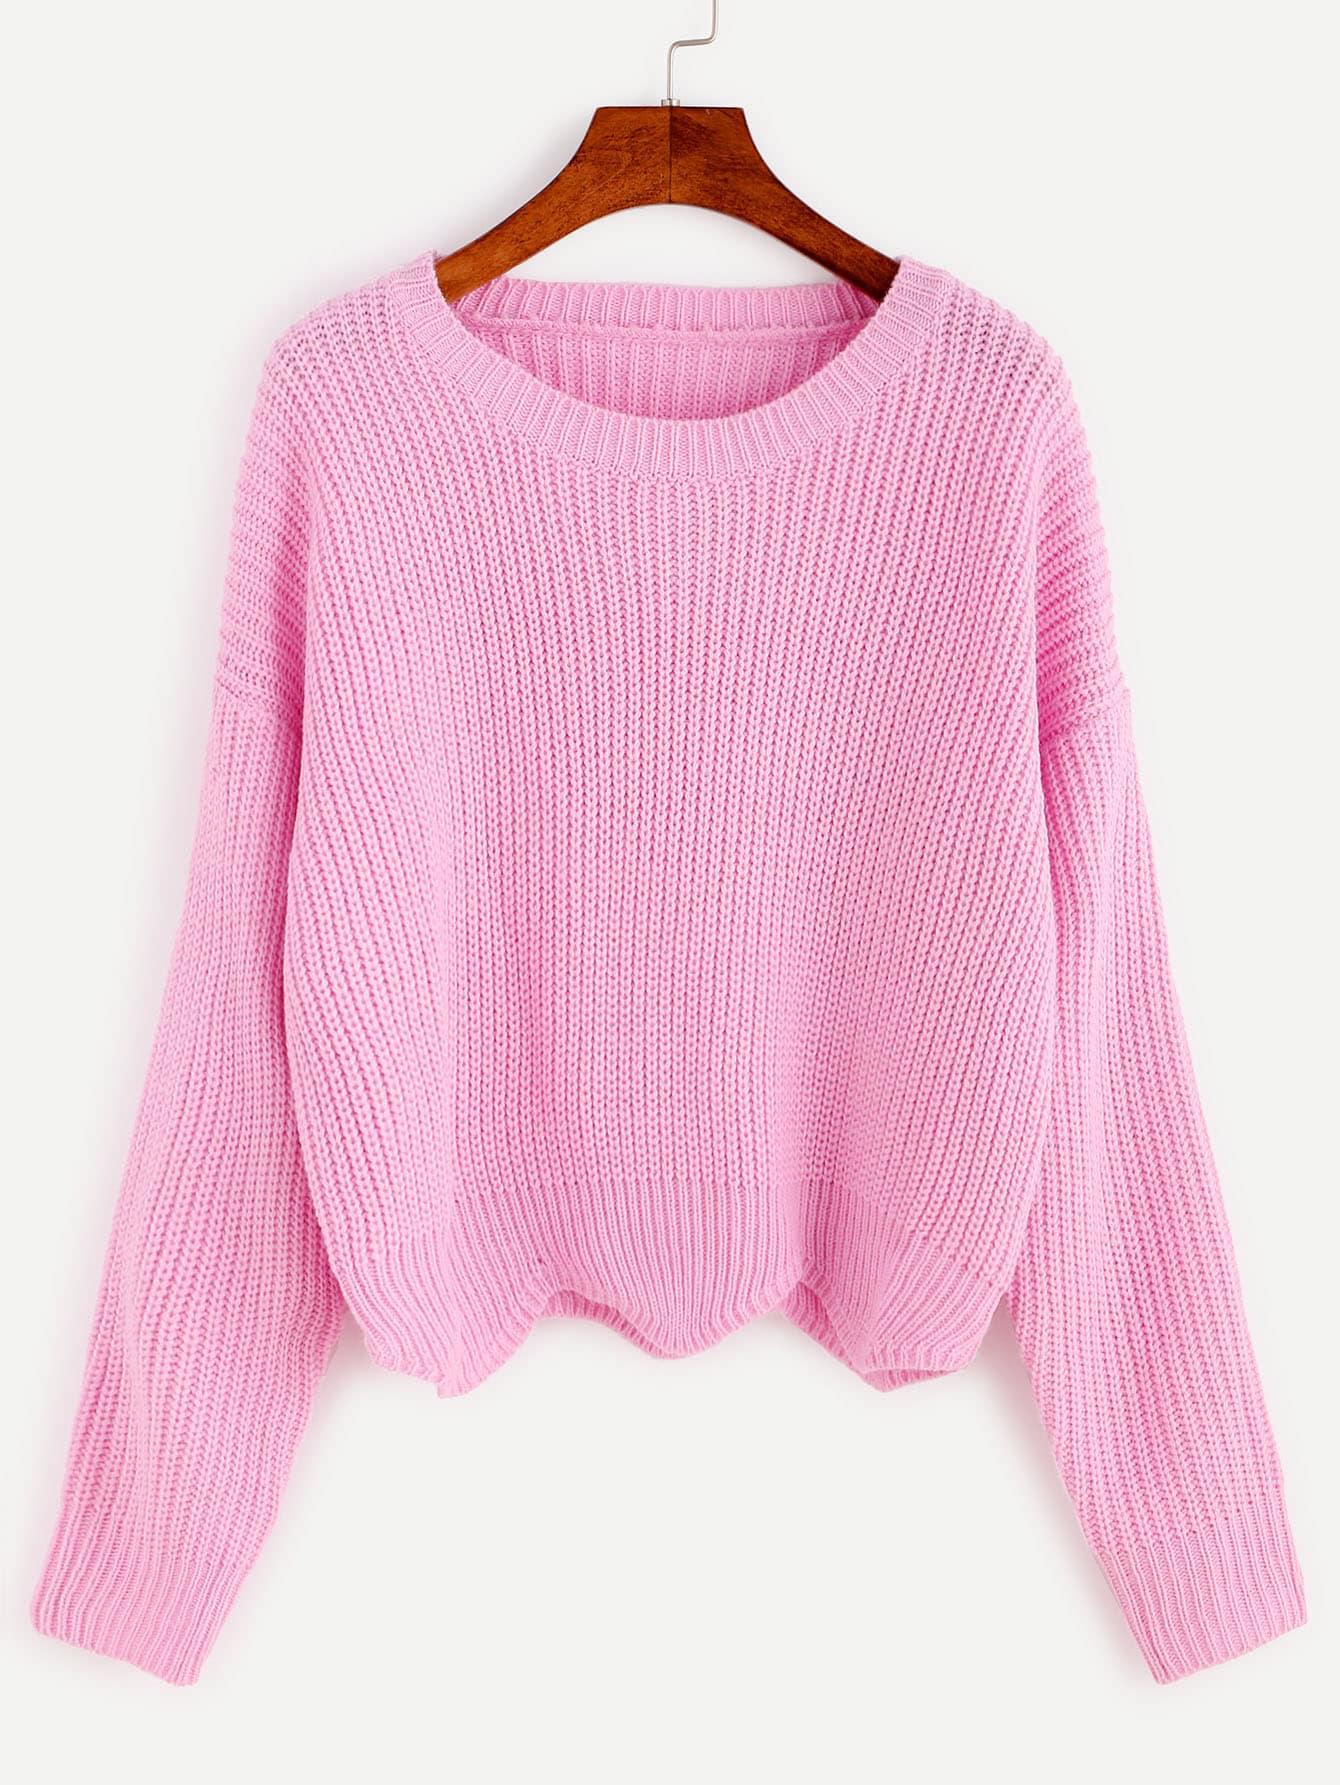 sweater161012132_2